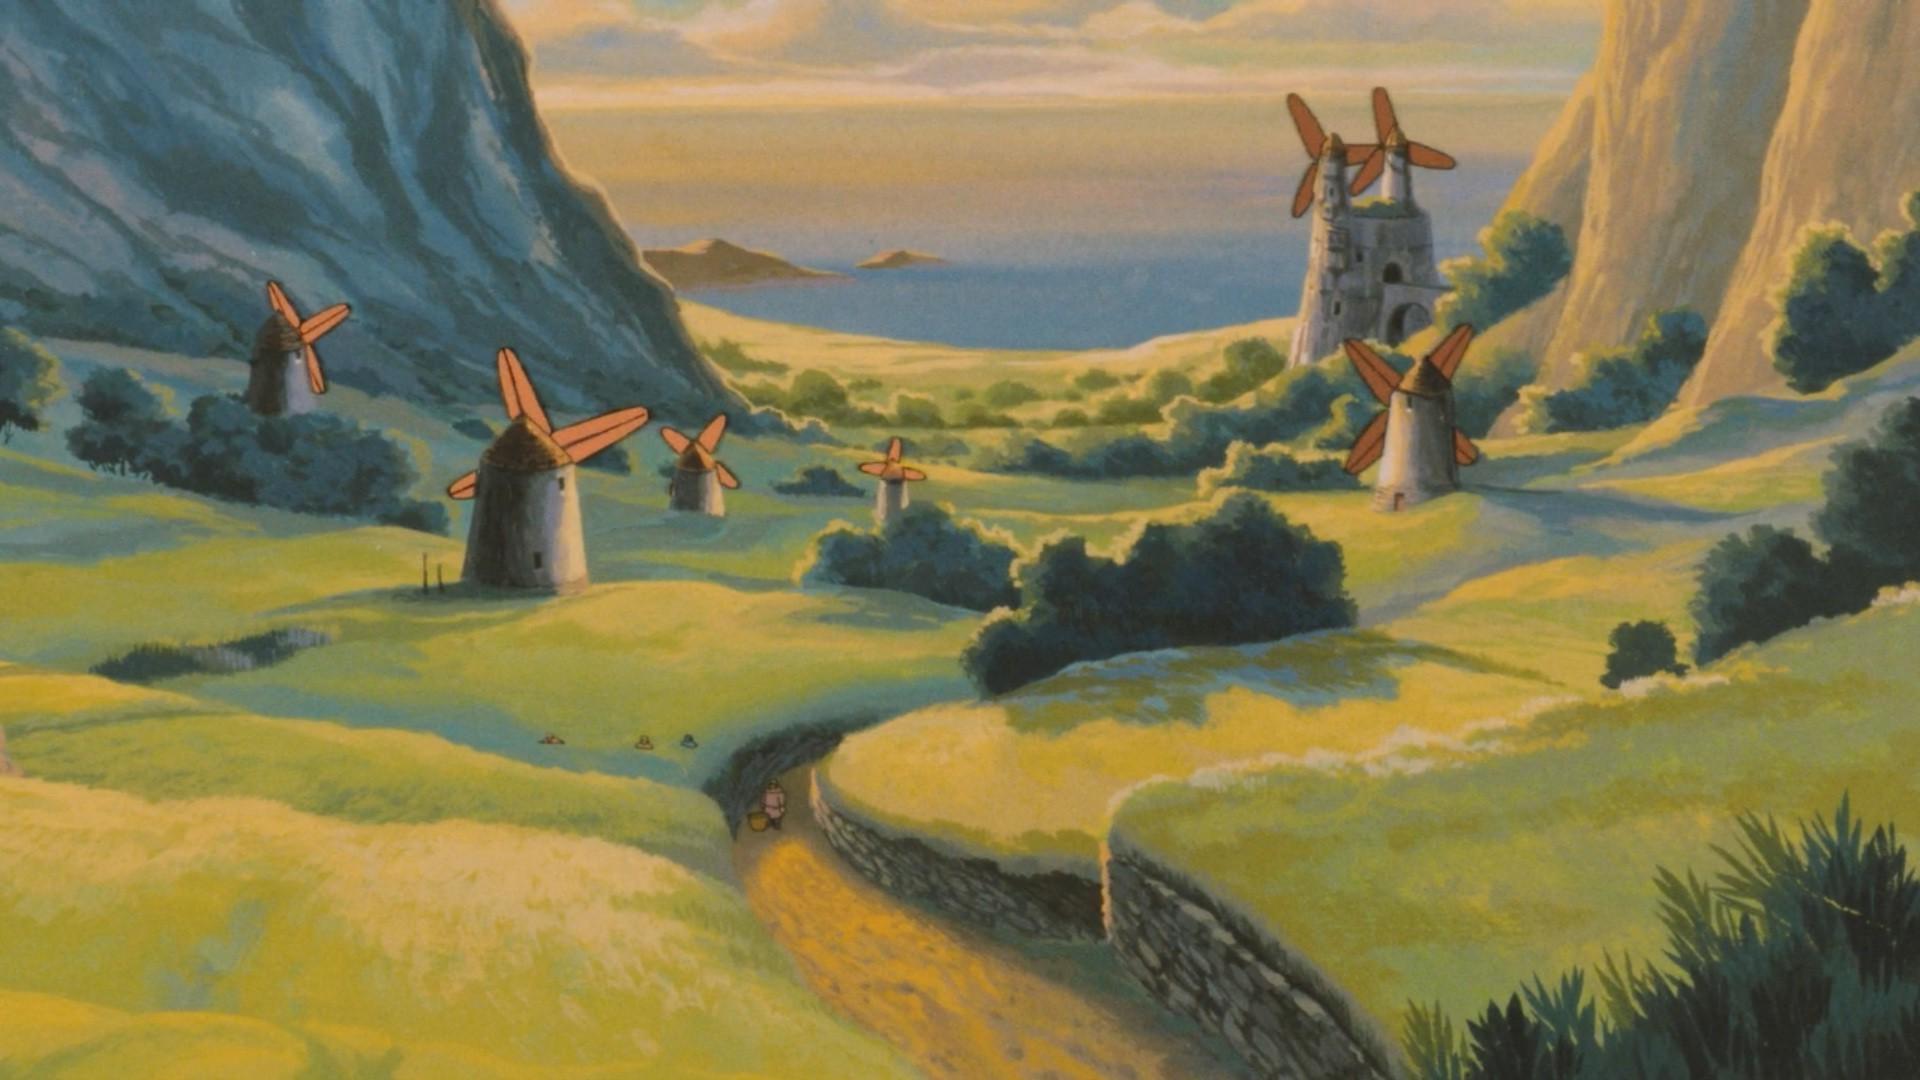 Studio Ghibli Wallpapers (71+ images) |Nausicaa Studio Ghibli Wallpaper